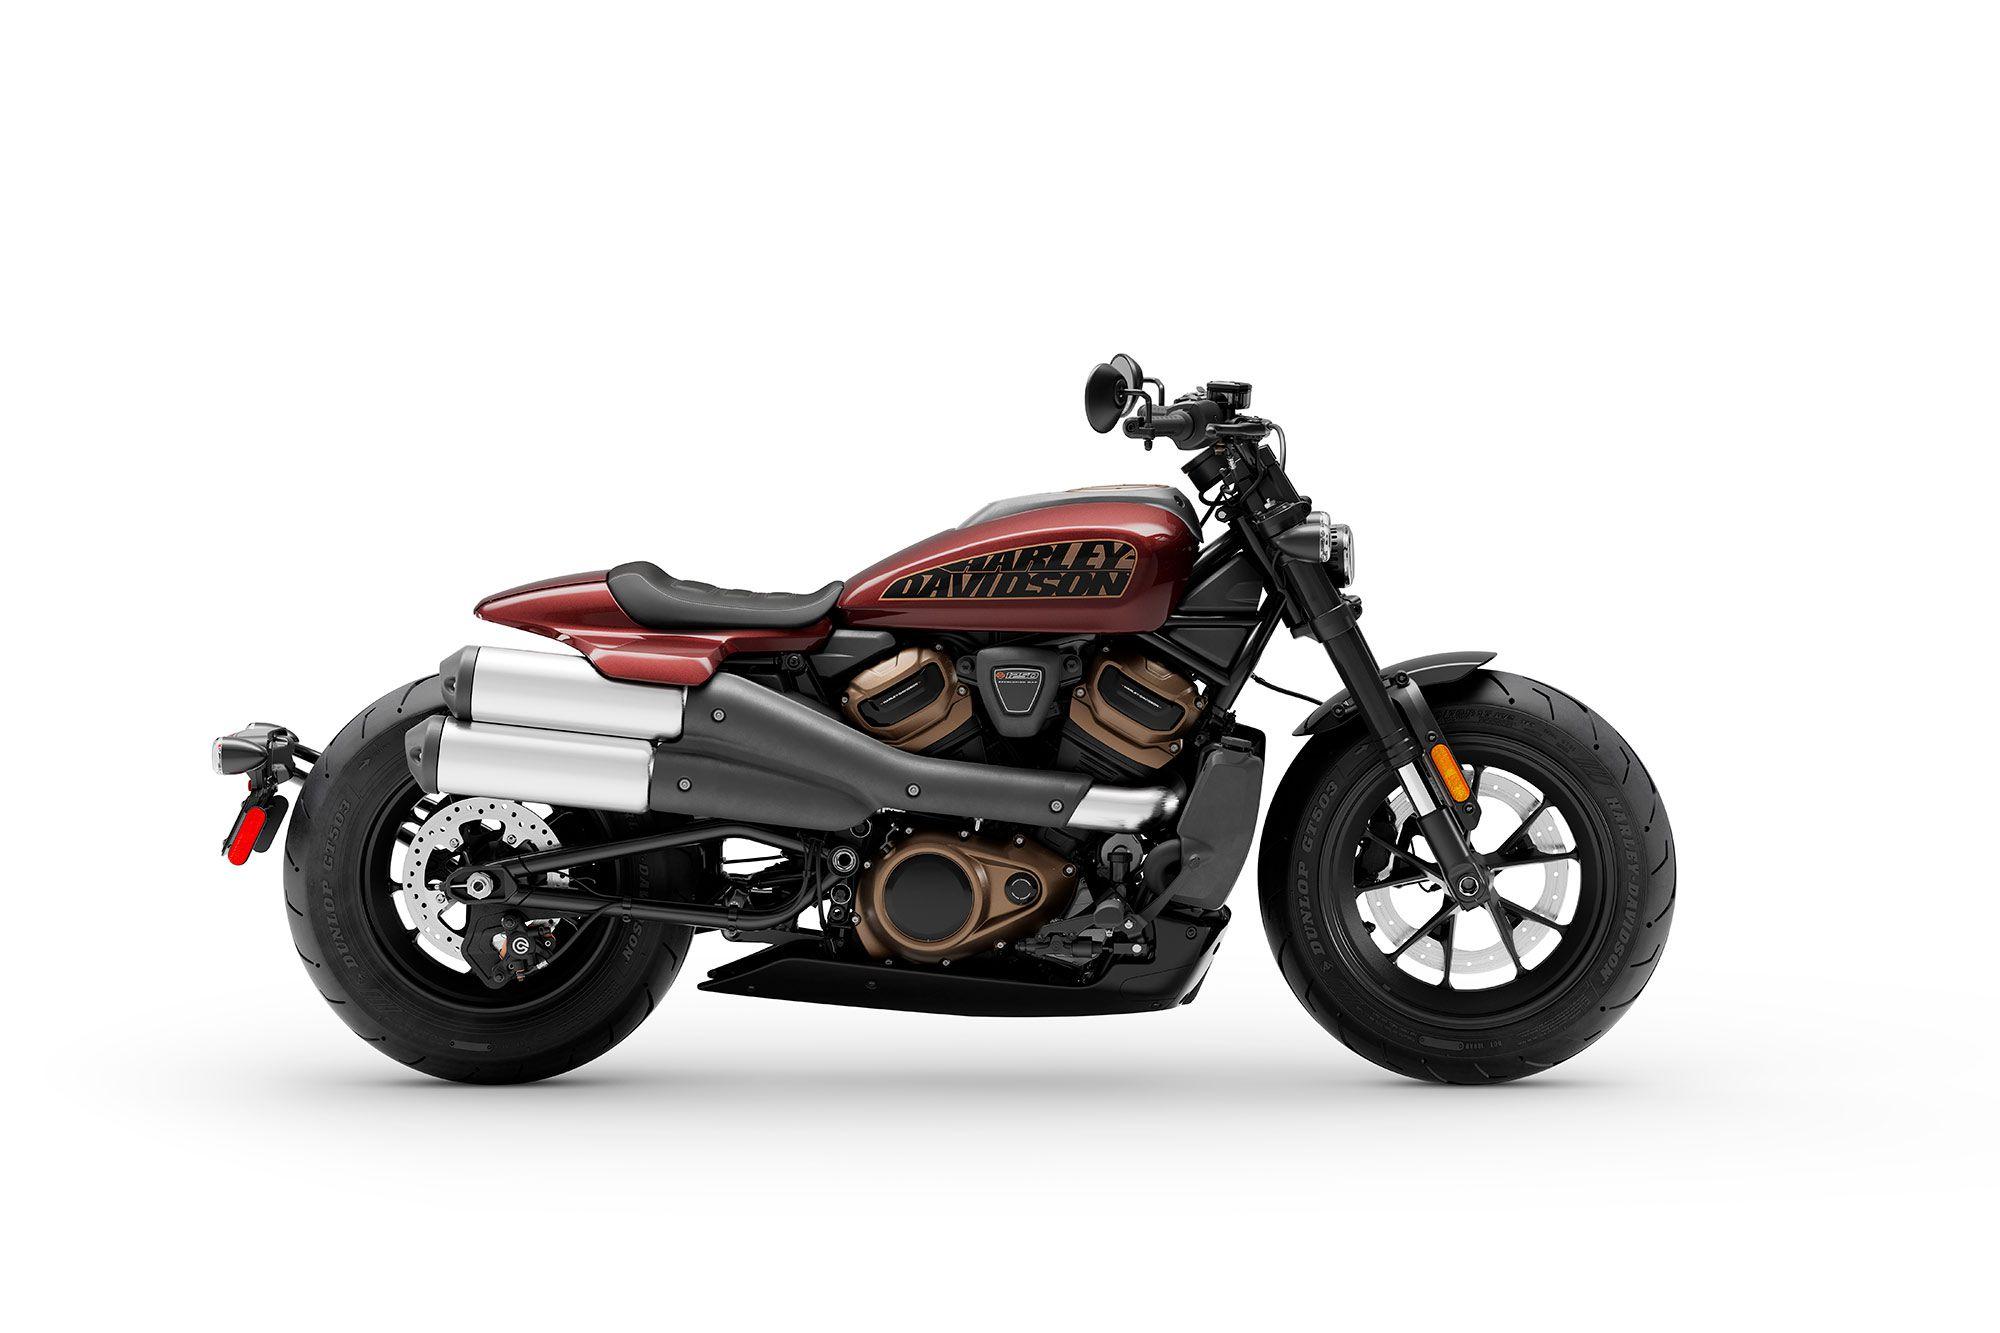 2021 Harley-Davidson Sportster S in Midnight Crimson.